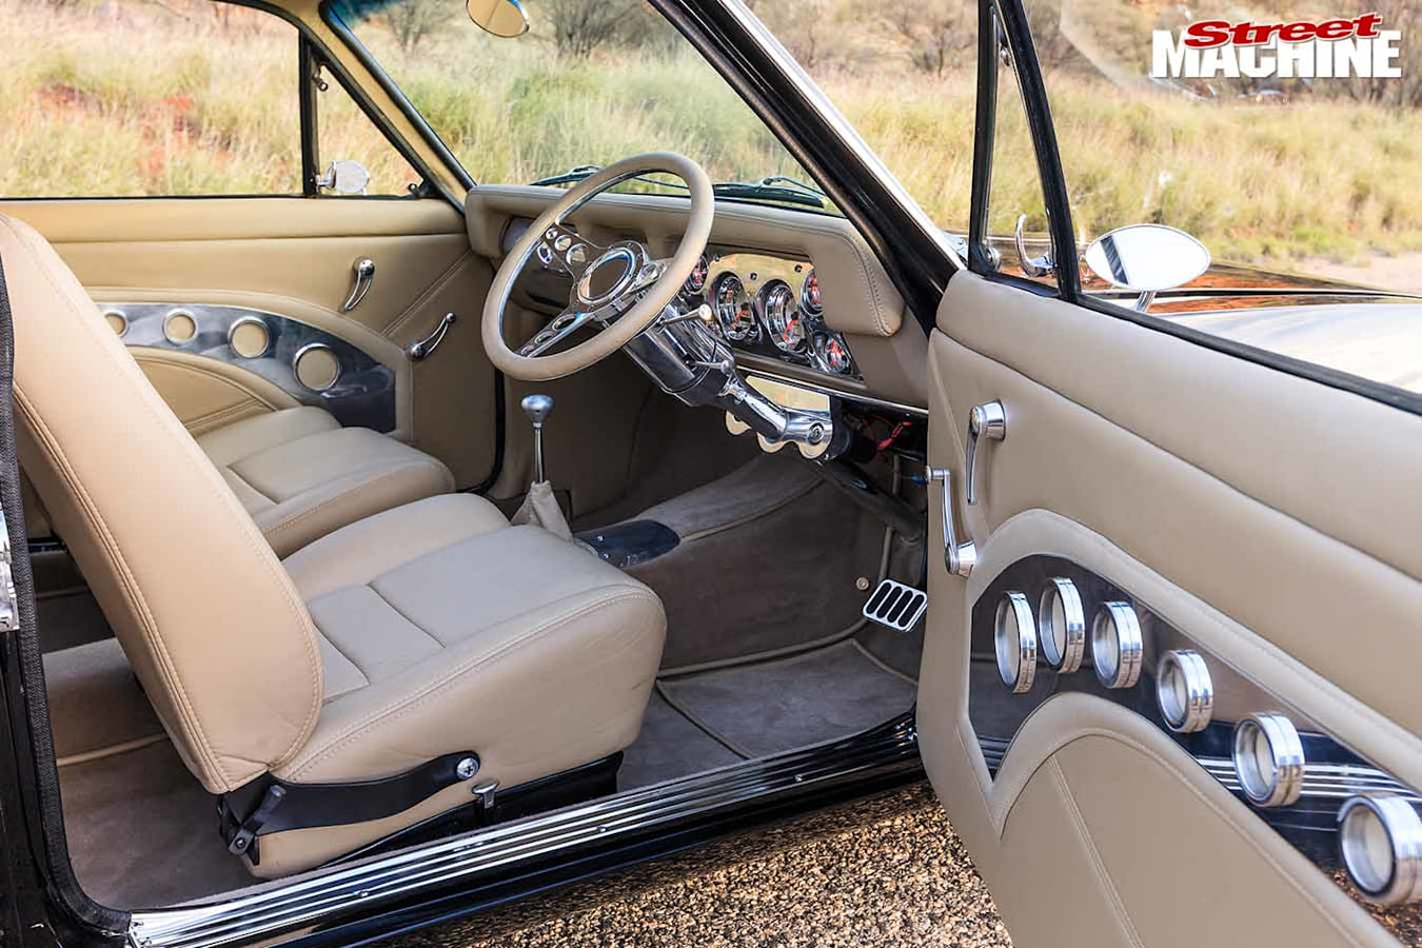 Holden Torana interior